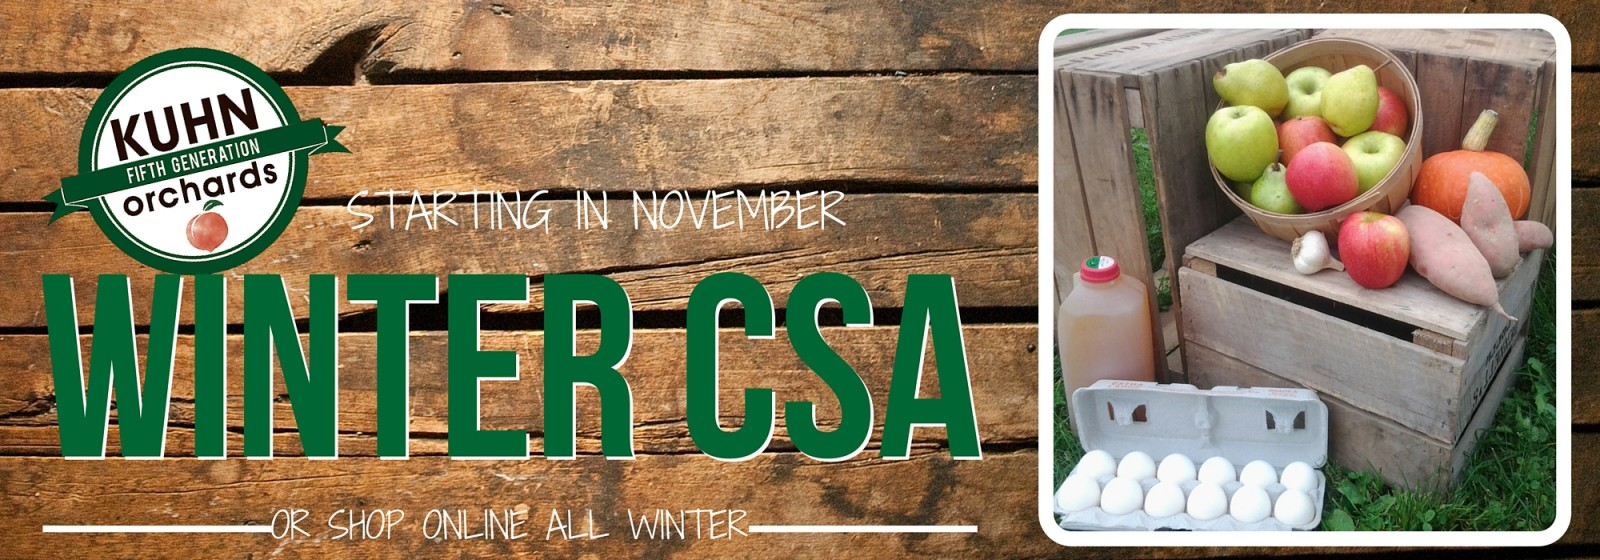 Winter CSA website